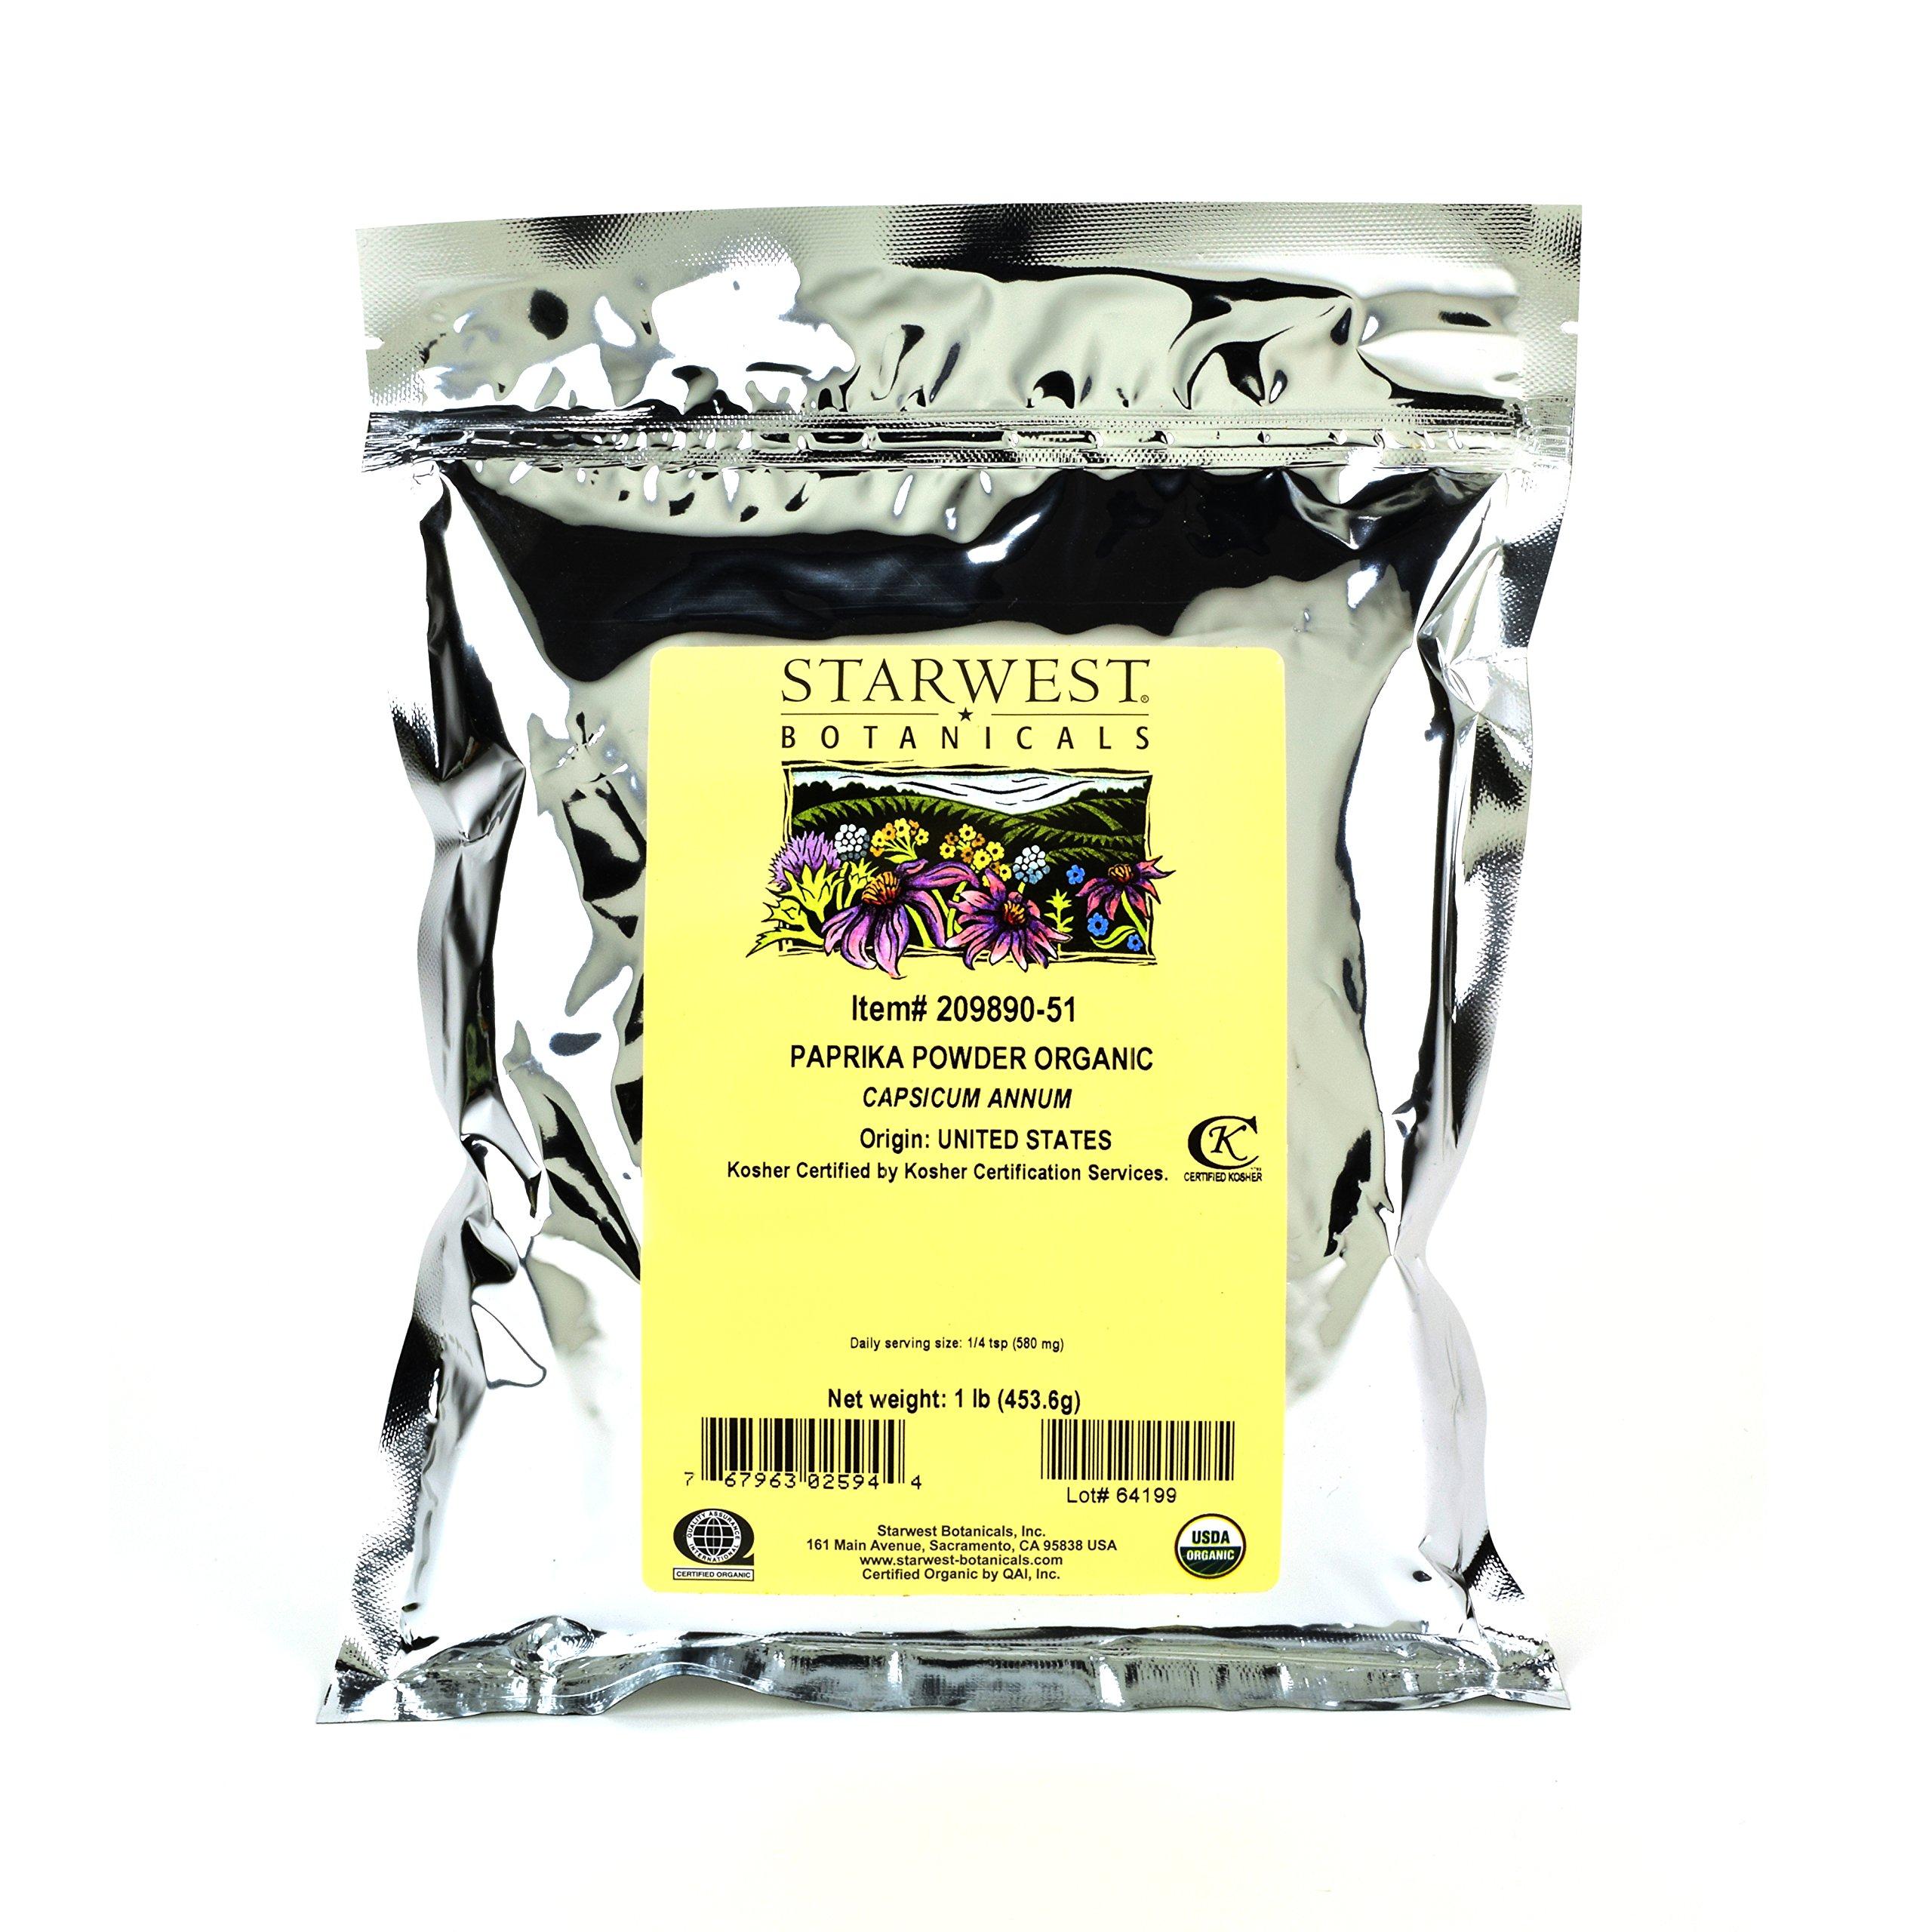 Starwest Botanicals Organic American Paprika Powder, 1 Pound Bulk Spice Bag